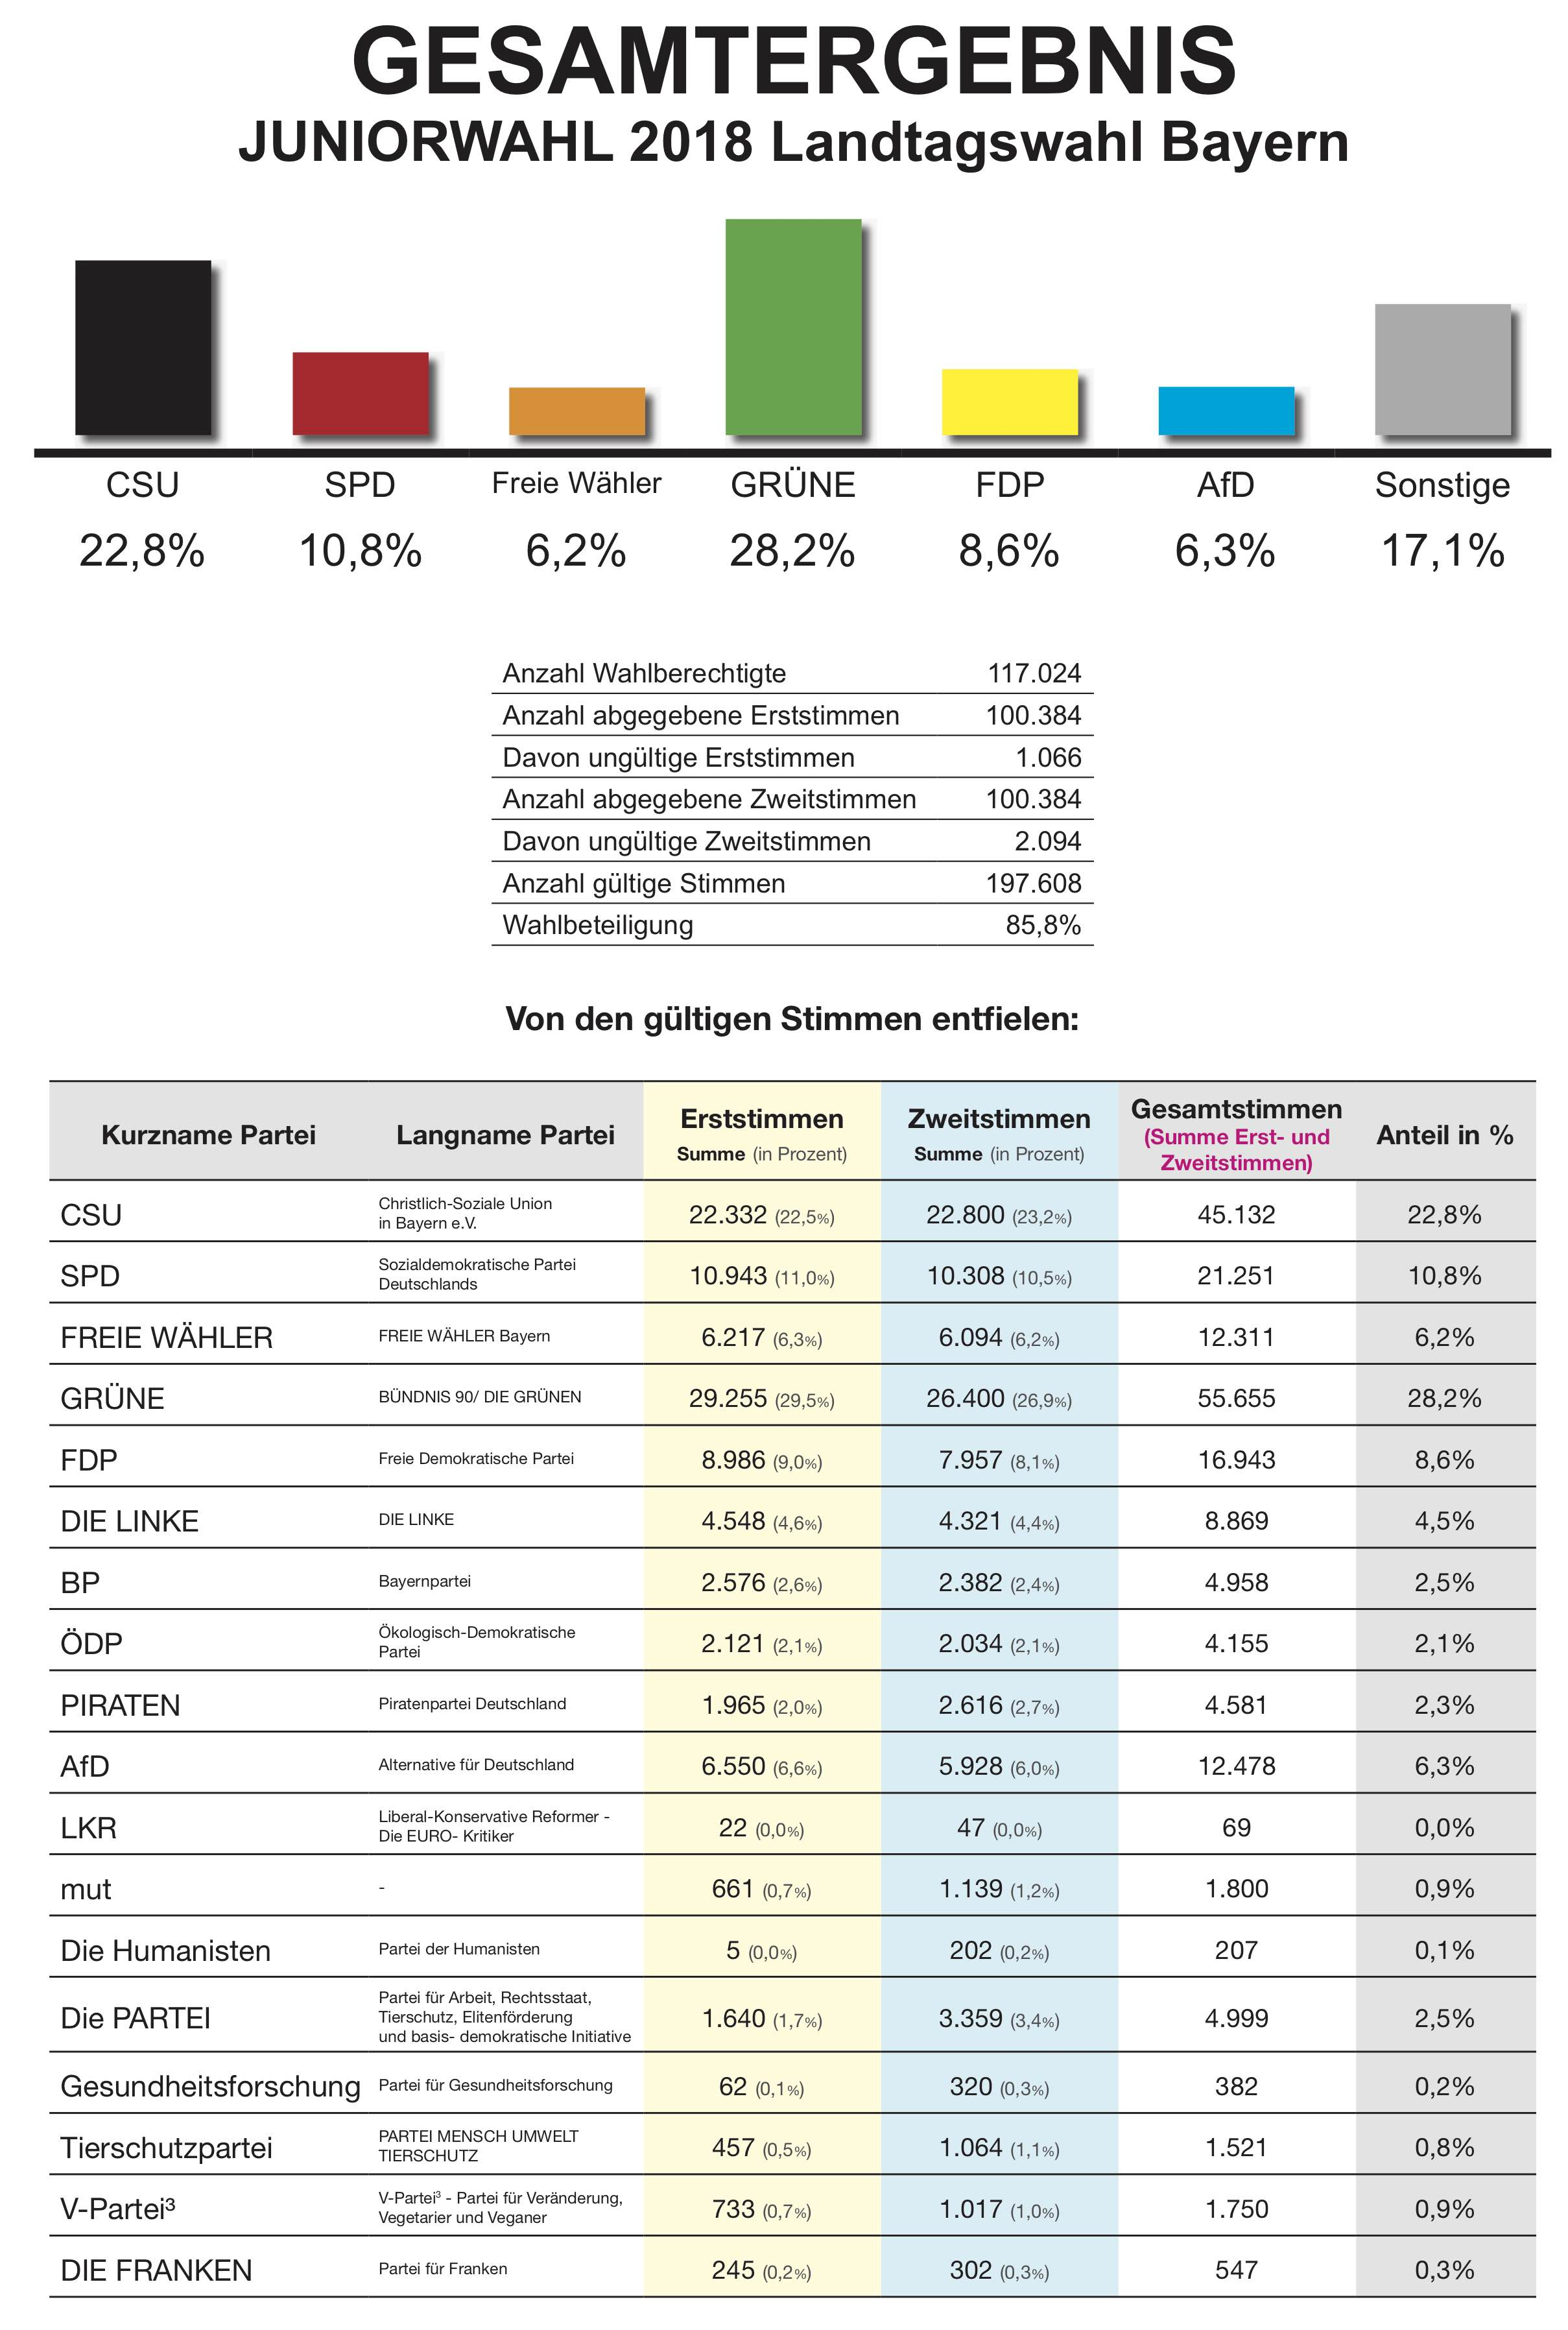 2018 Juniorwahl - Ergebnisgrafik